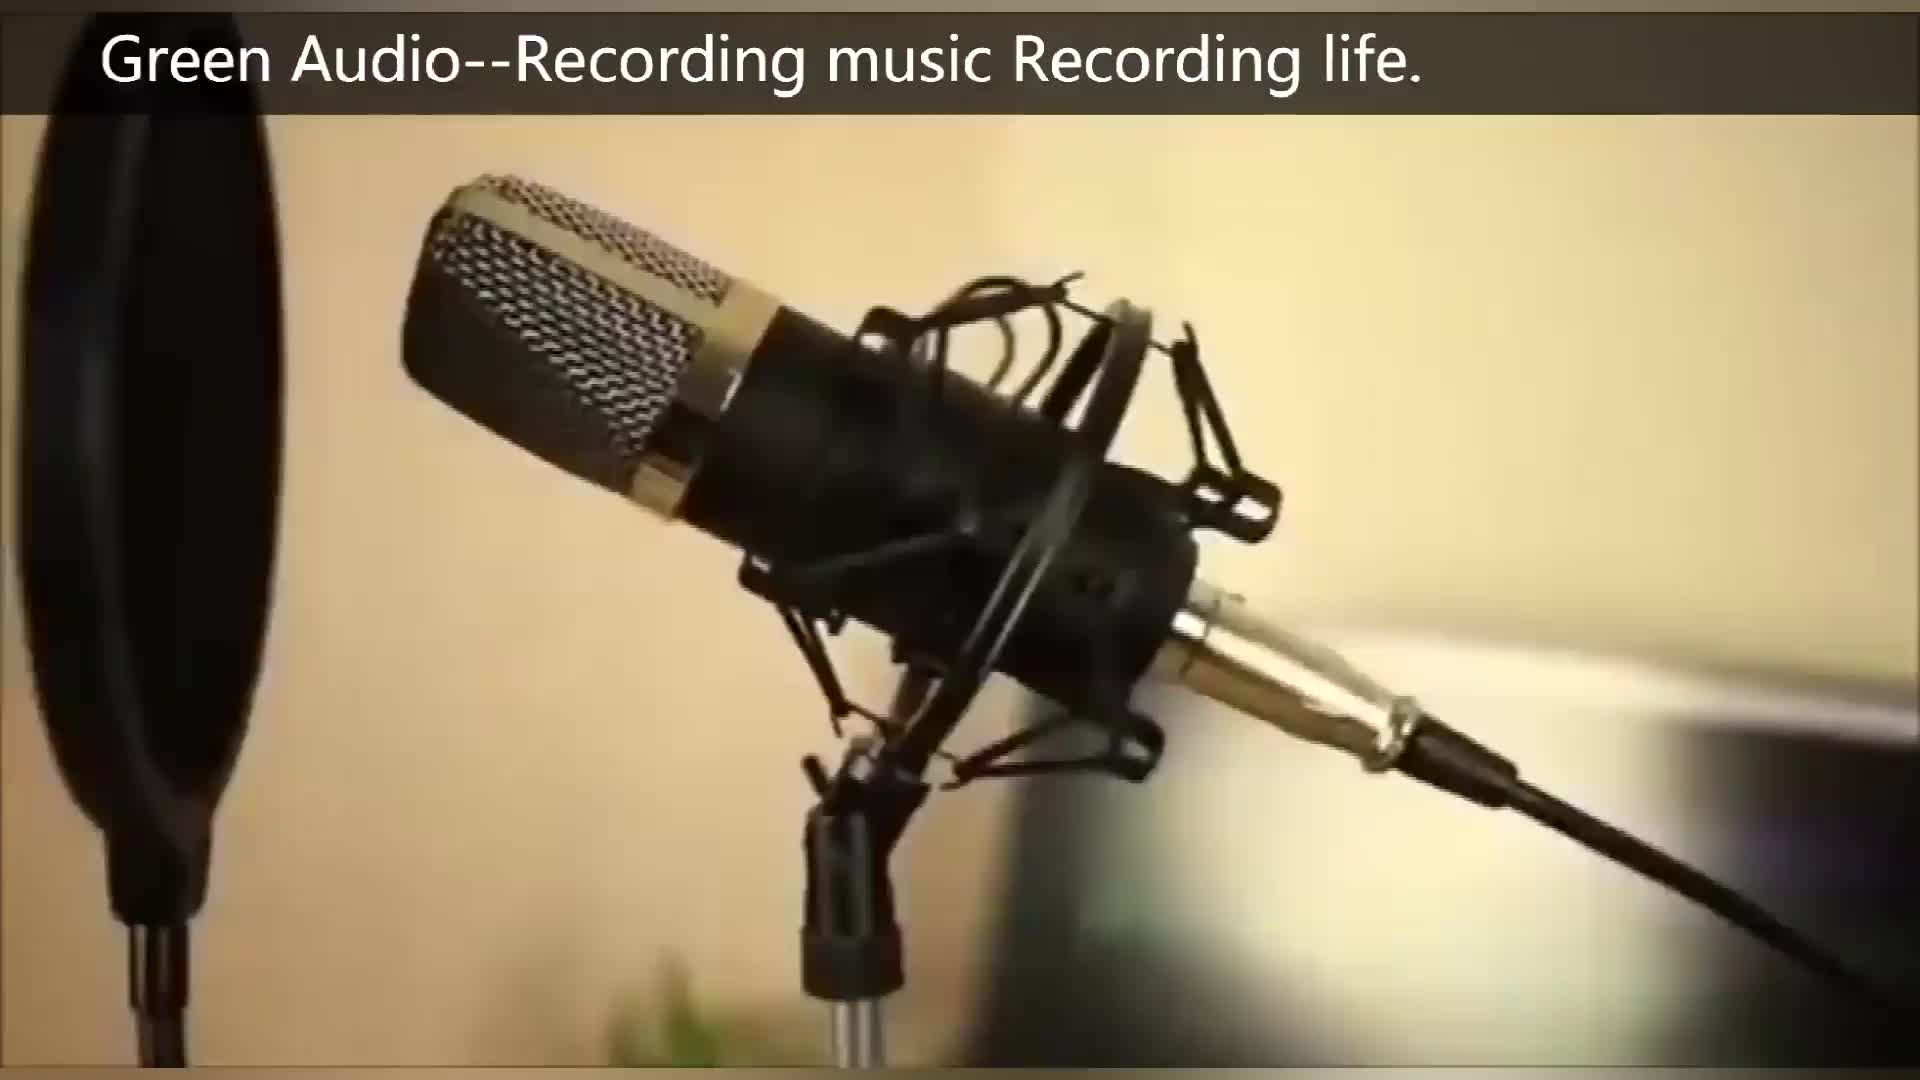 BM-800 Green Audio Microphone Professional Studio Condenser Sound Recording Microphone